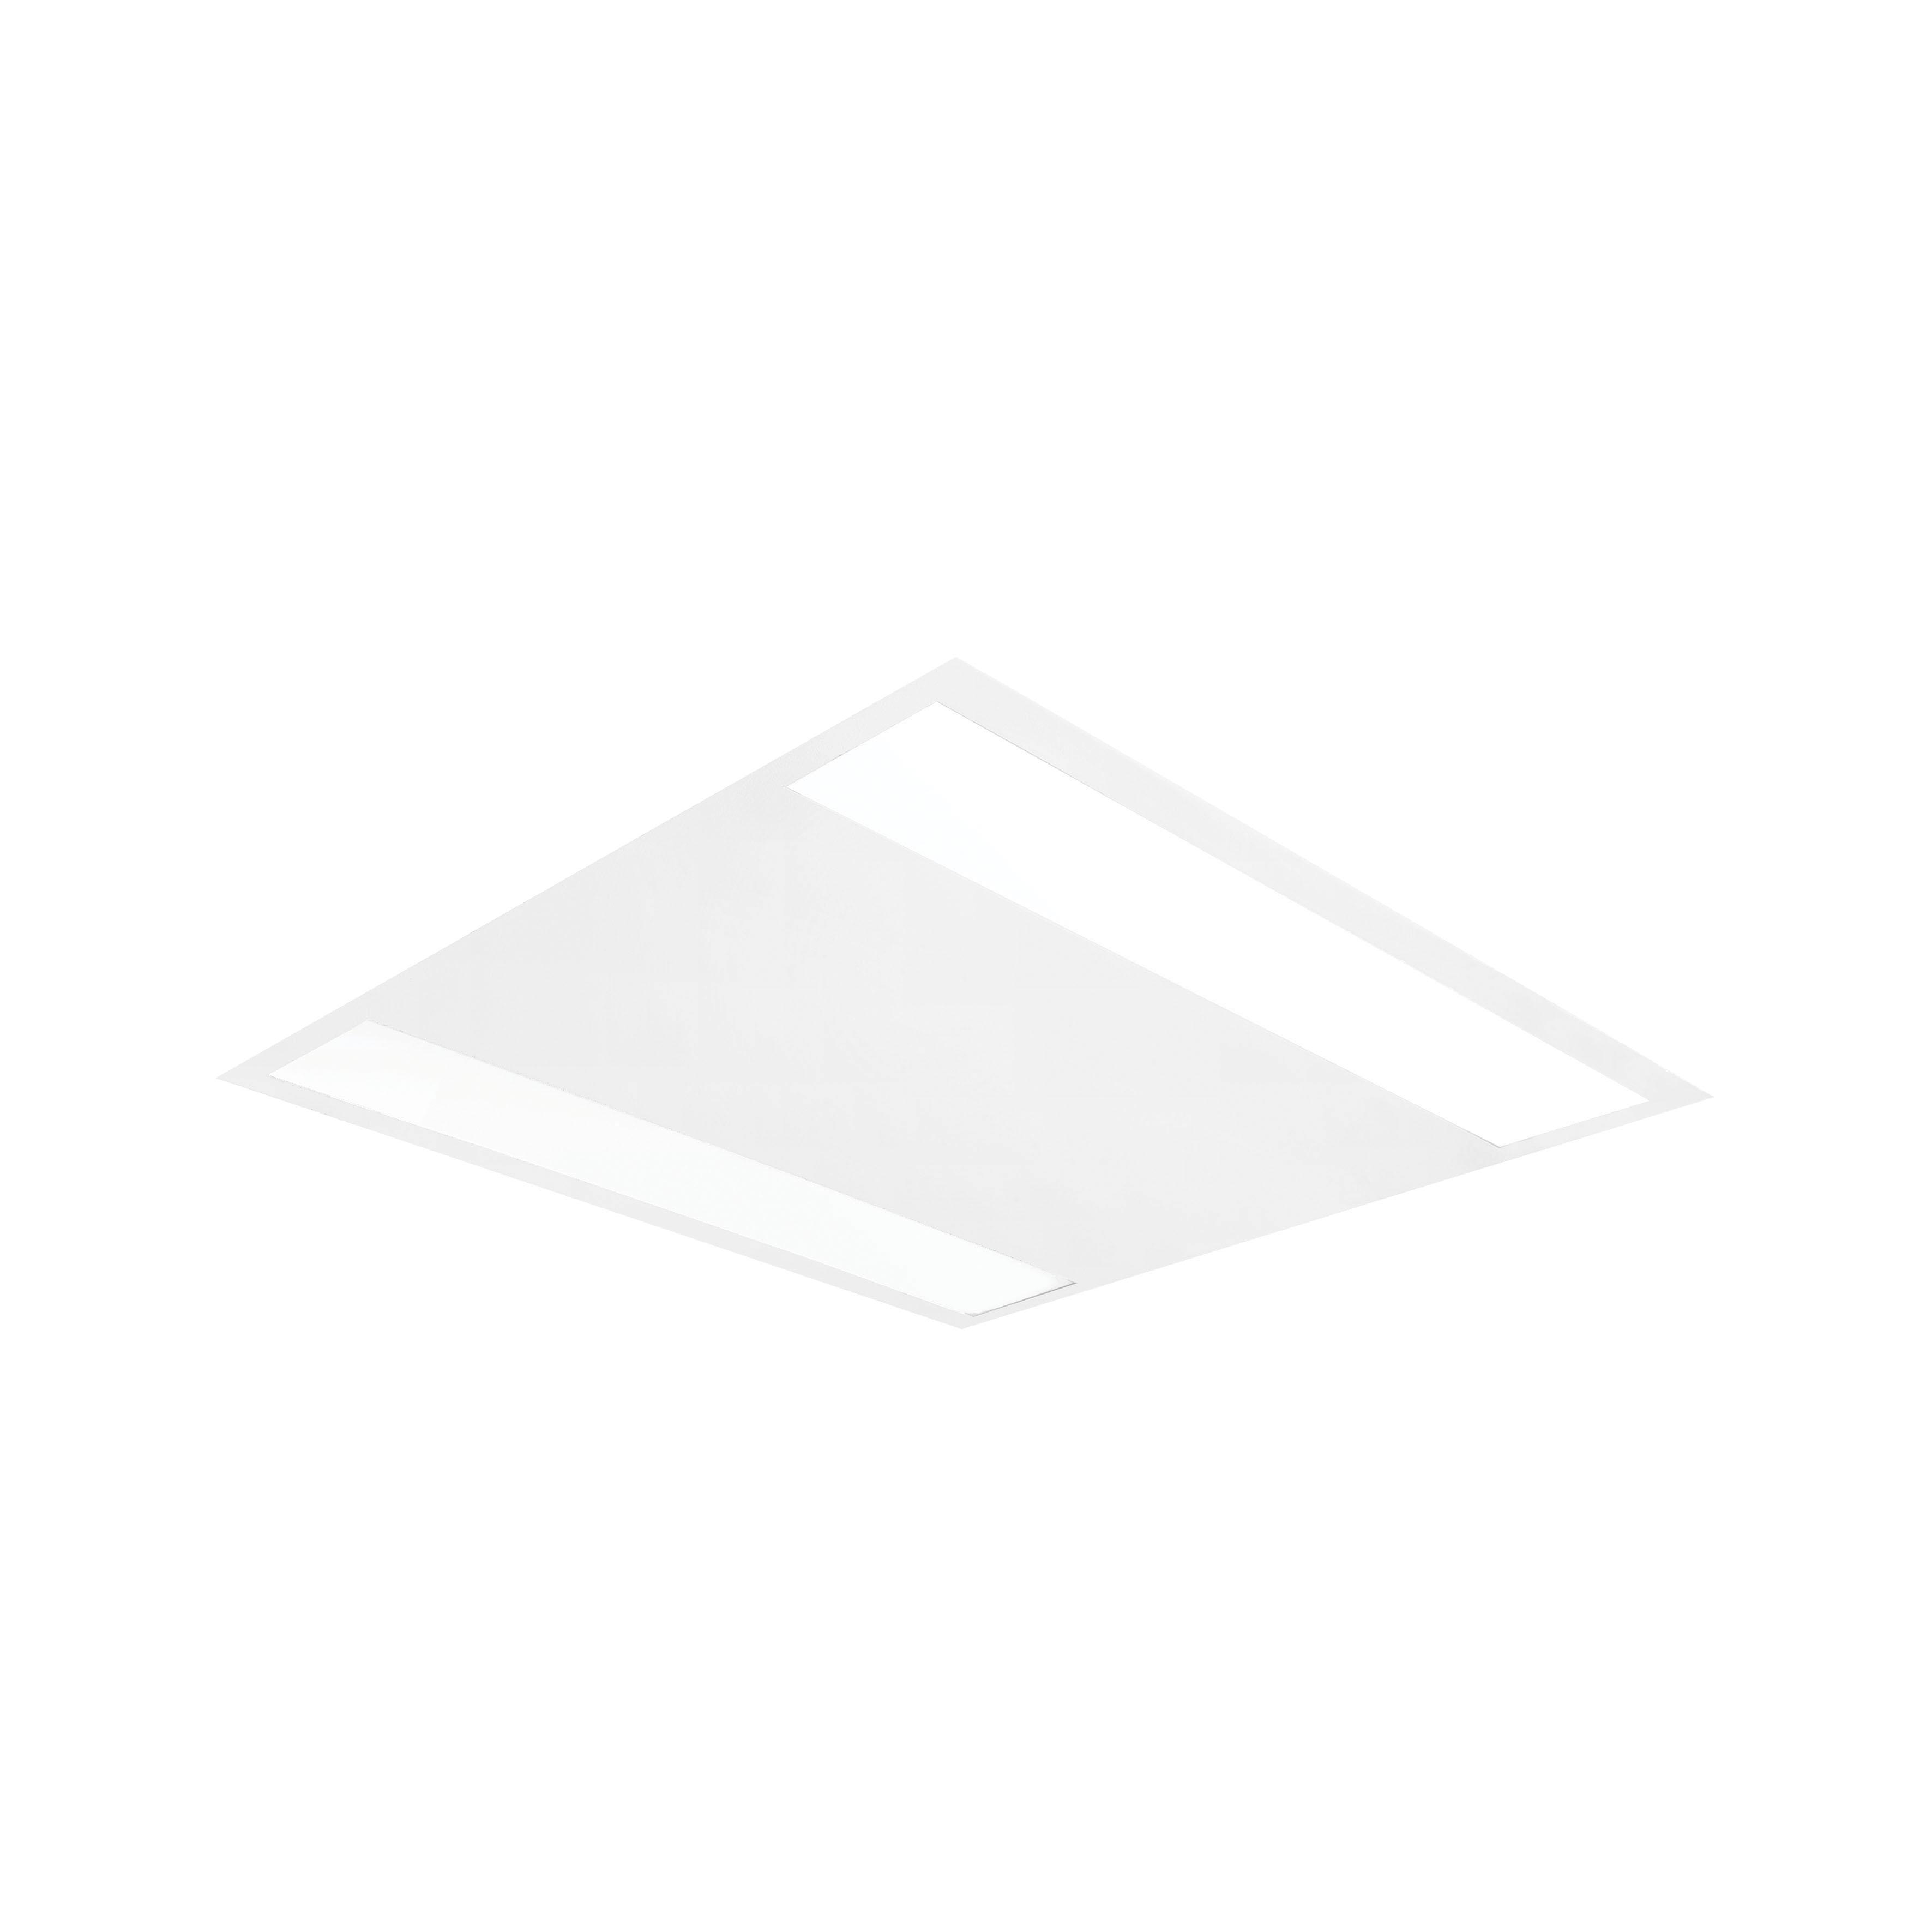 afb-gamma-illumination-recessed-adj-1